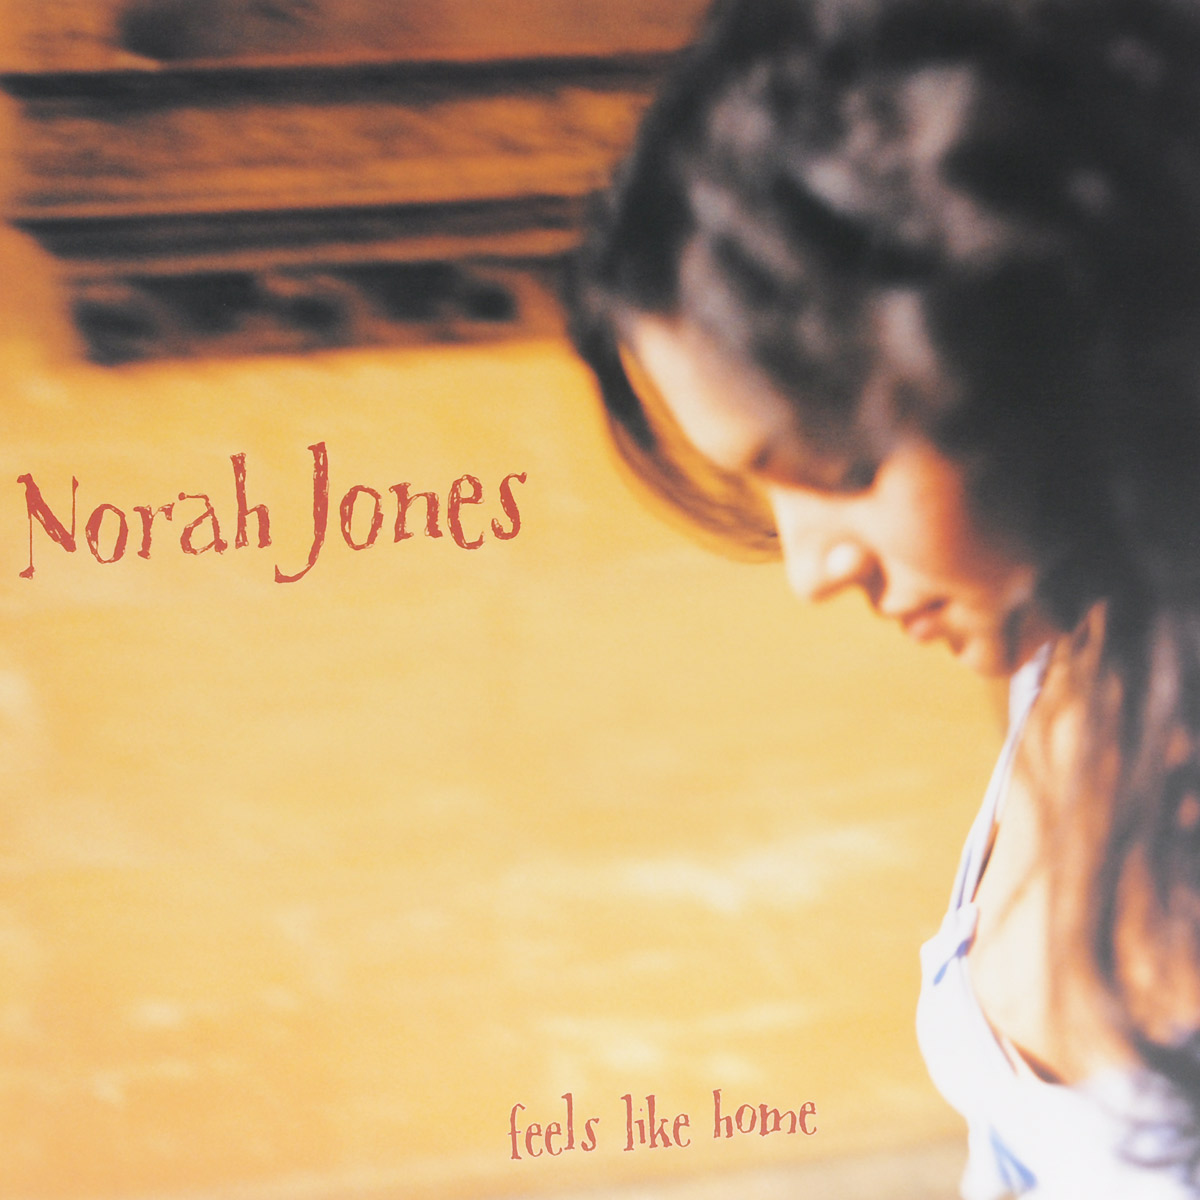 Нора Джонс Norah Jones. Feels Like Home (LP) защитная пленка lp универсальная 2 8 матовая